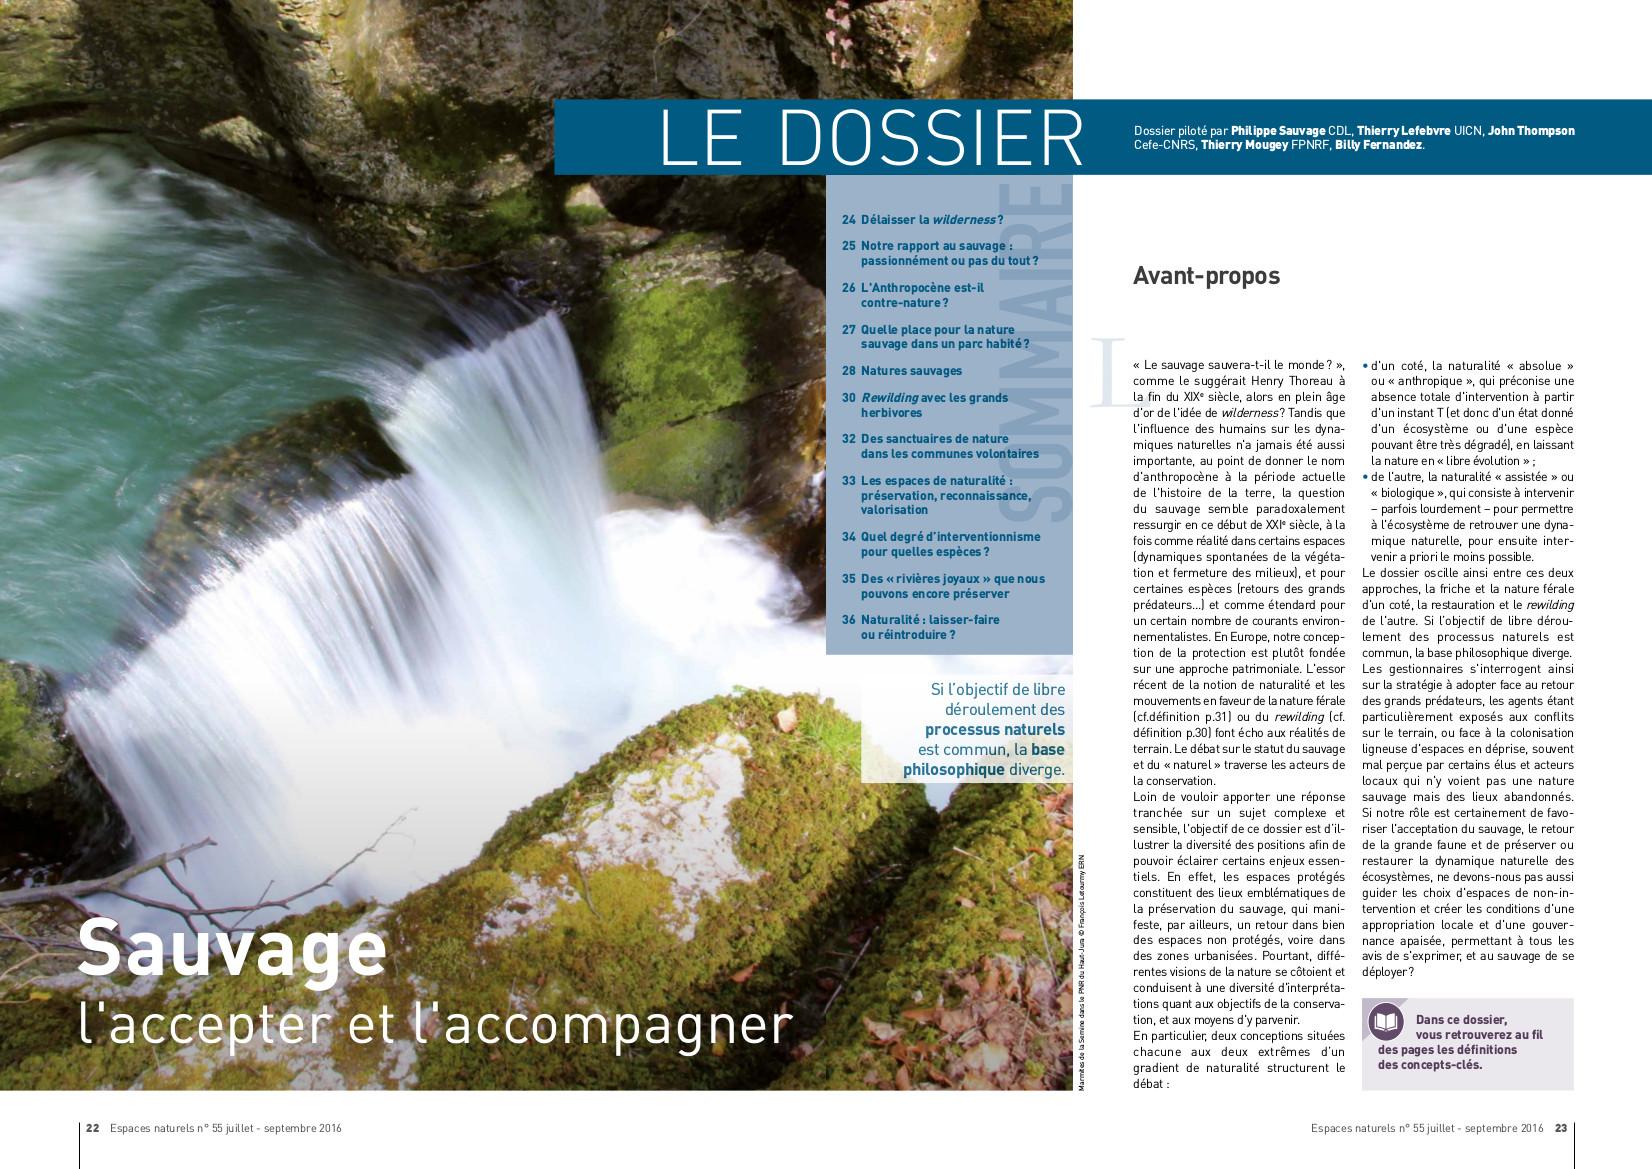 Sauvage, l'accepter et l'accompagner, Espaces Naturels n°55, juillet -septembre 2016